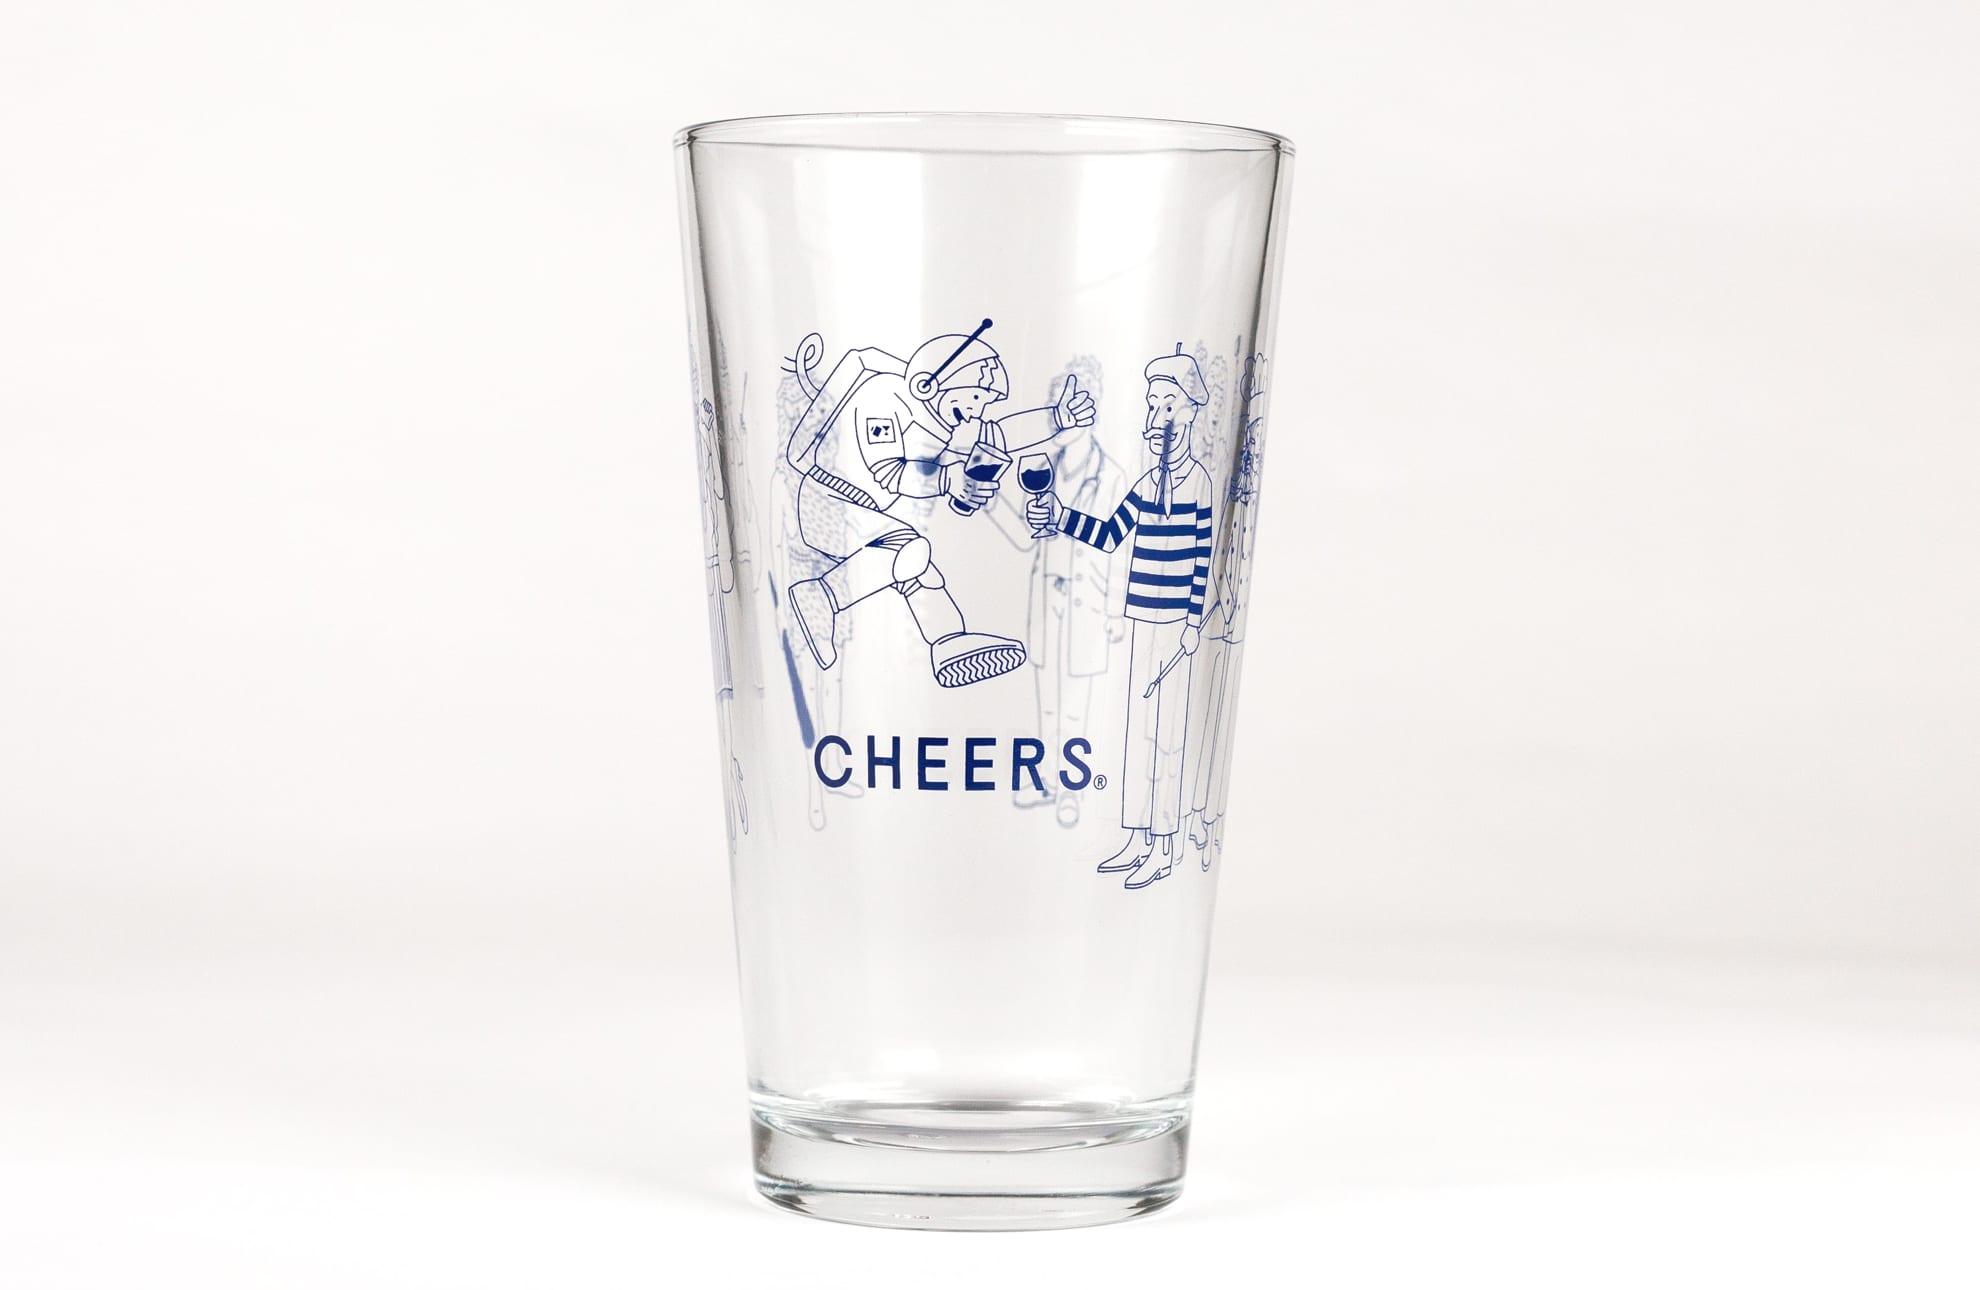 Cheers Pint Glass